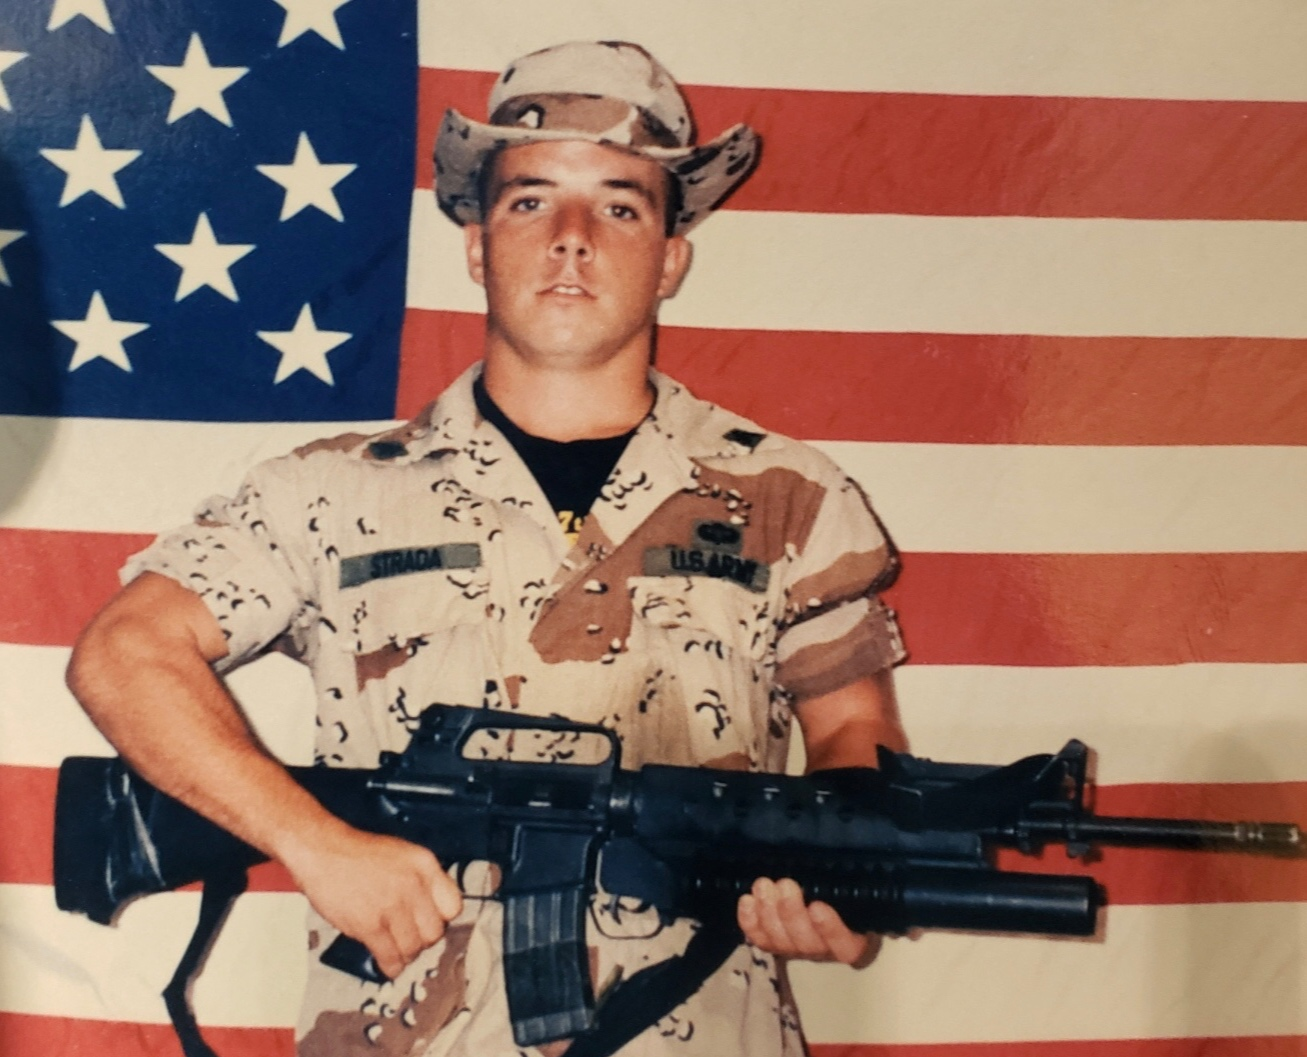 Mike+Military+pic.jpg